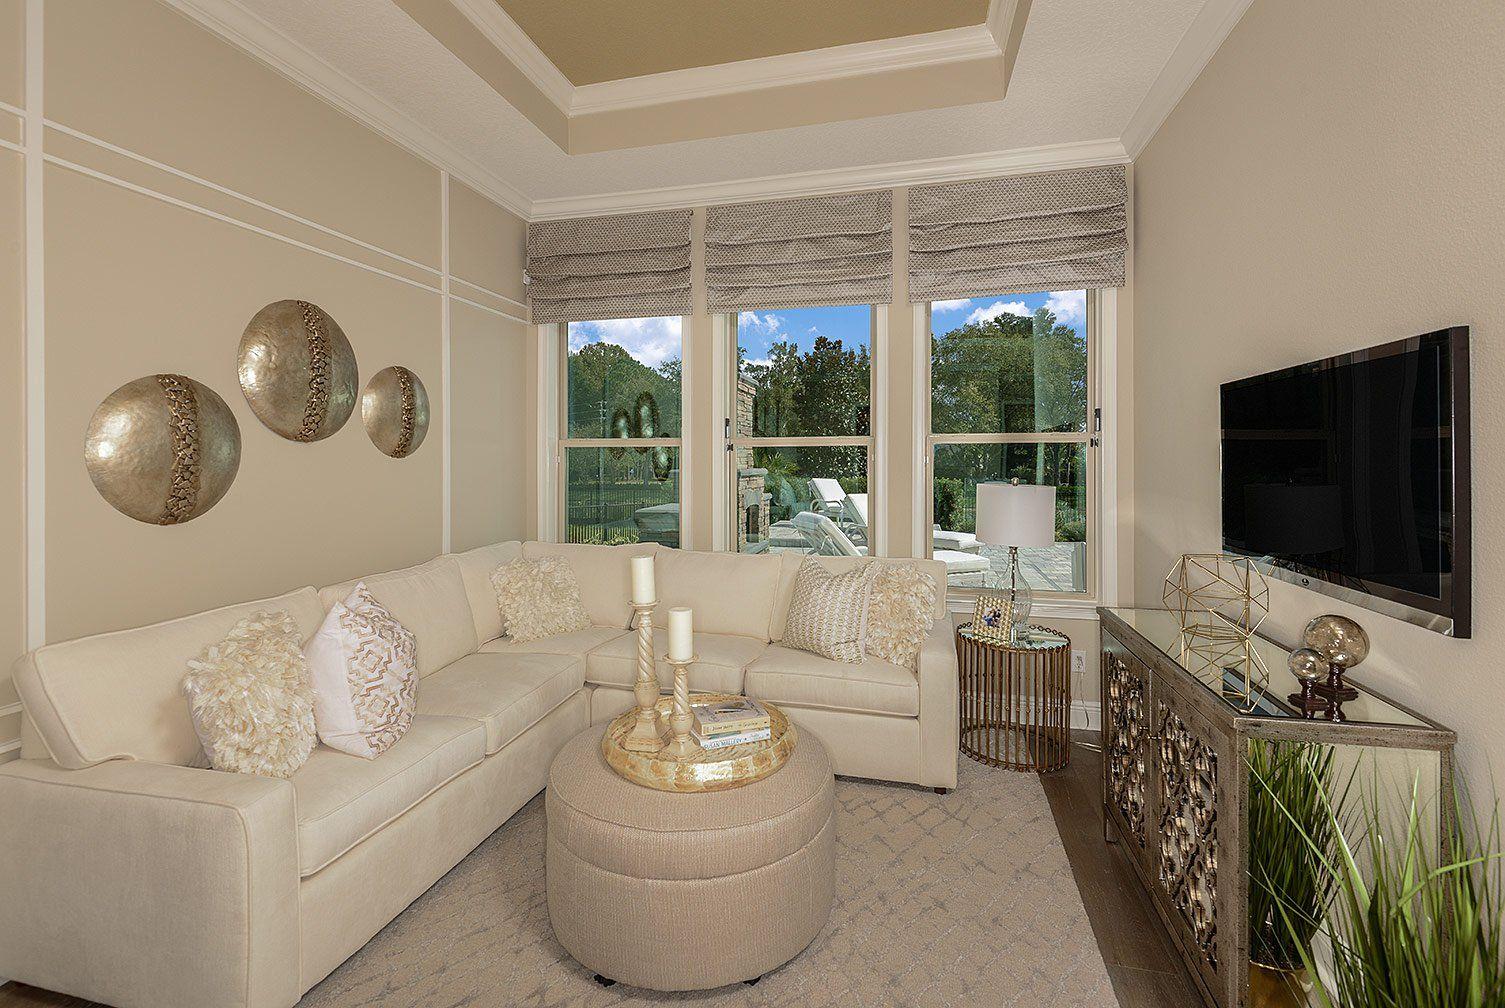 Greatroom-in-Monte Carlo-at-Hamlin - The Cove-in-Winter Garden